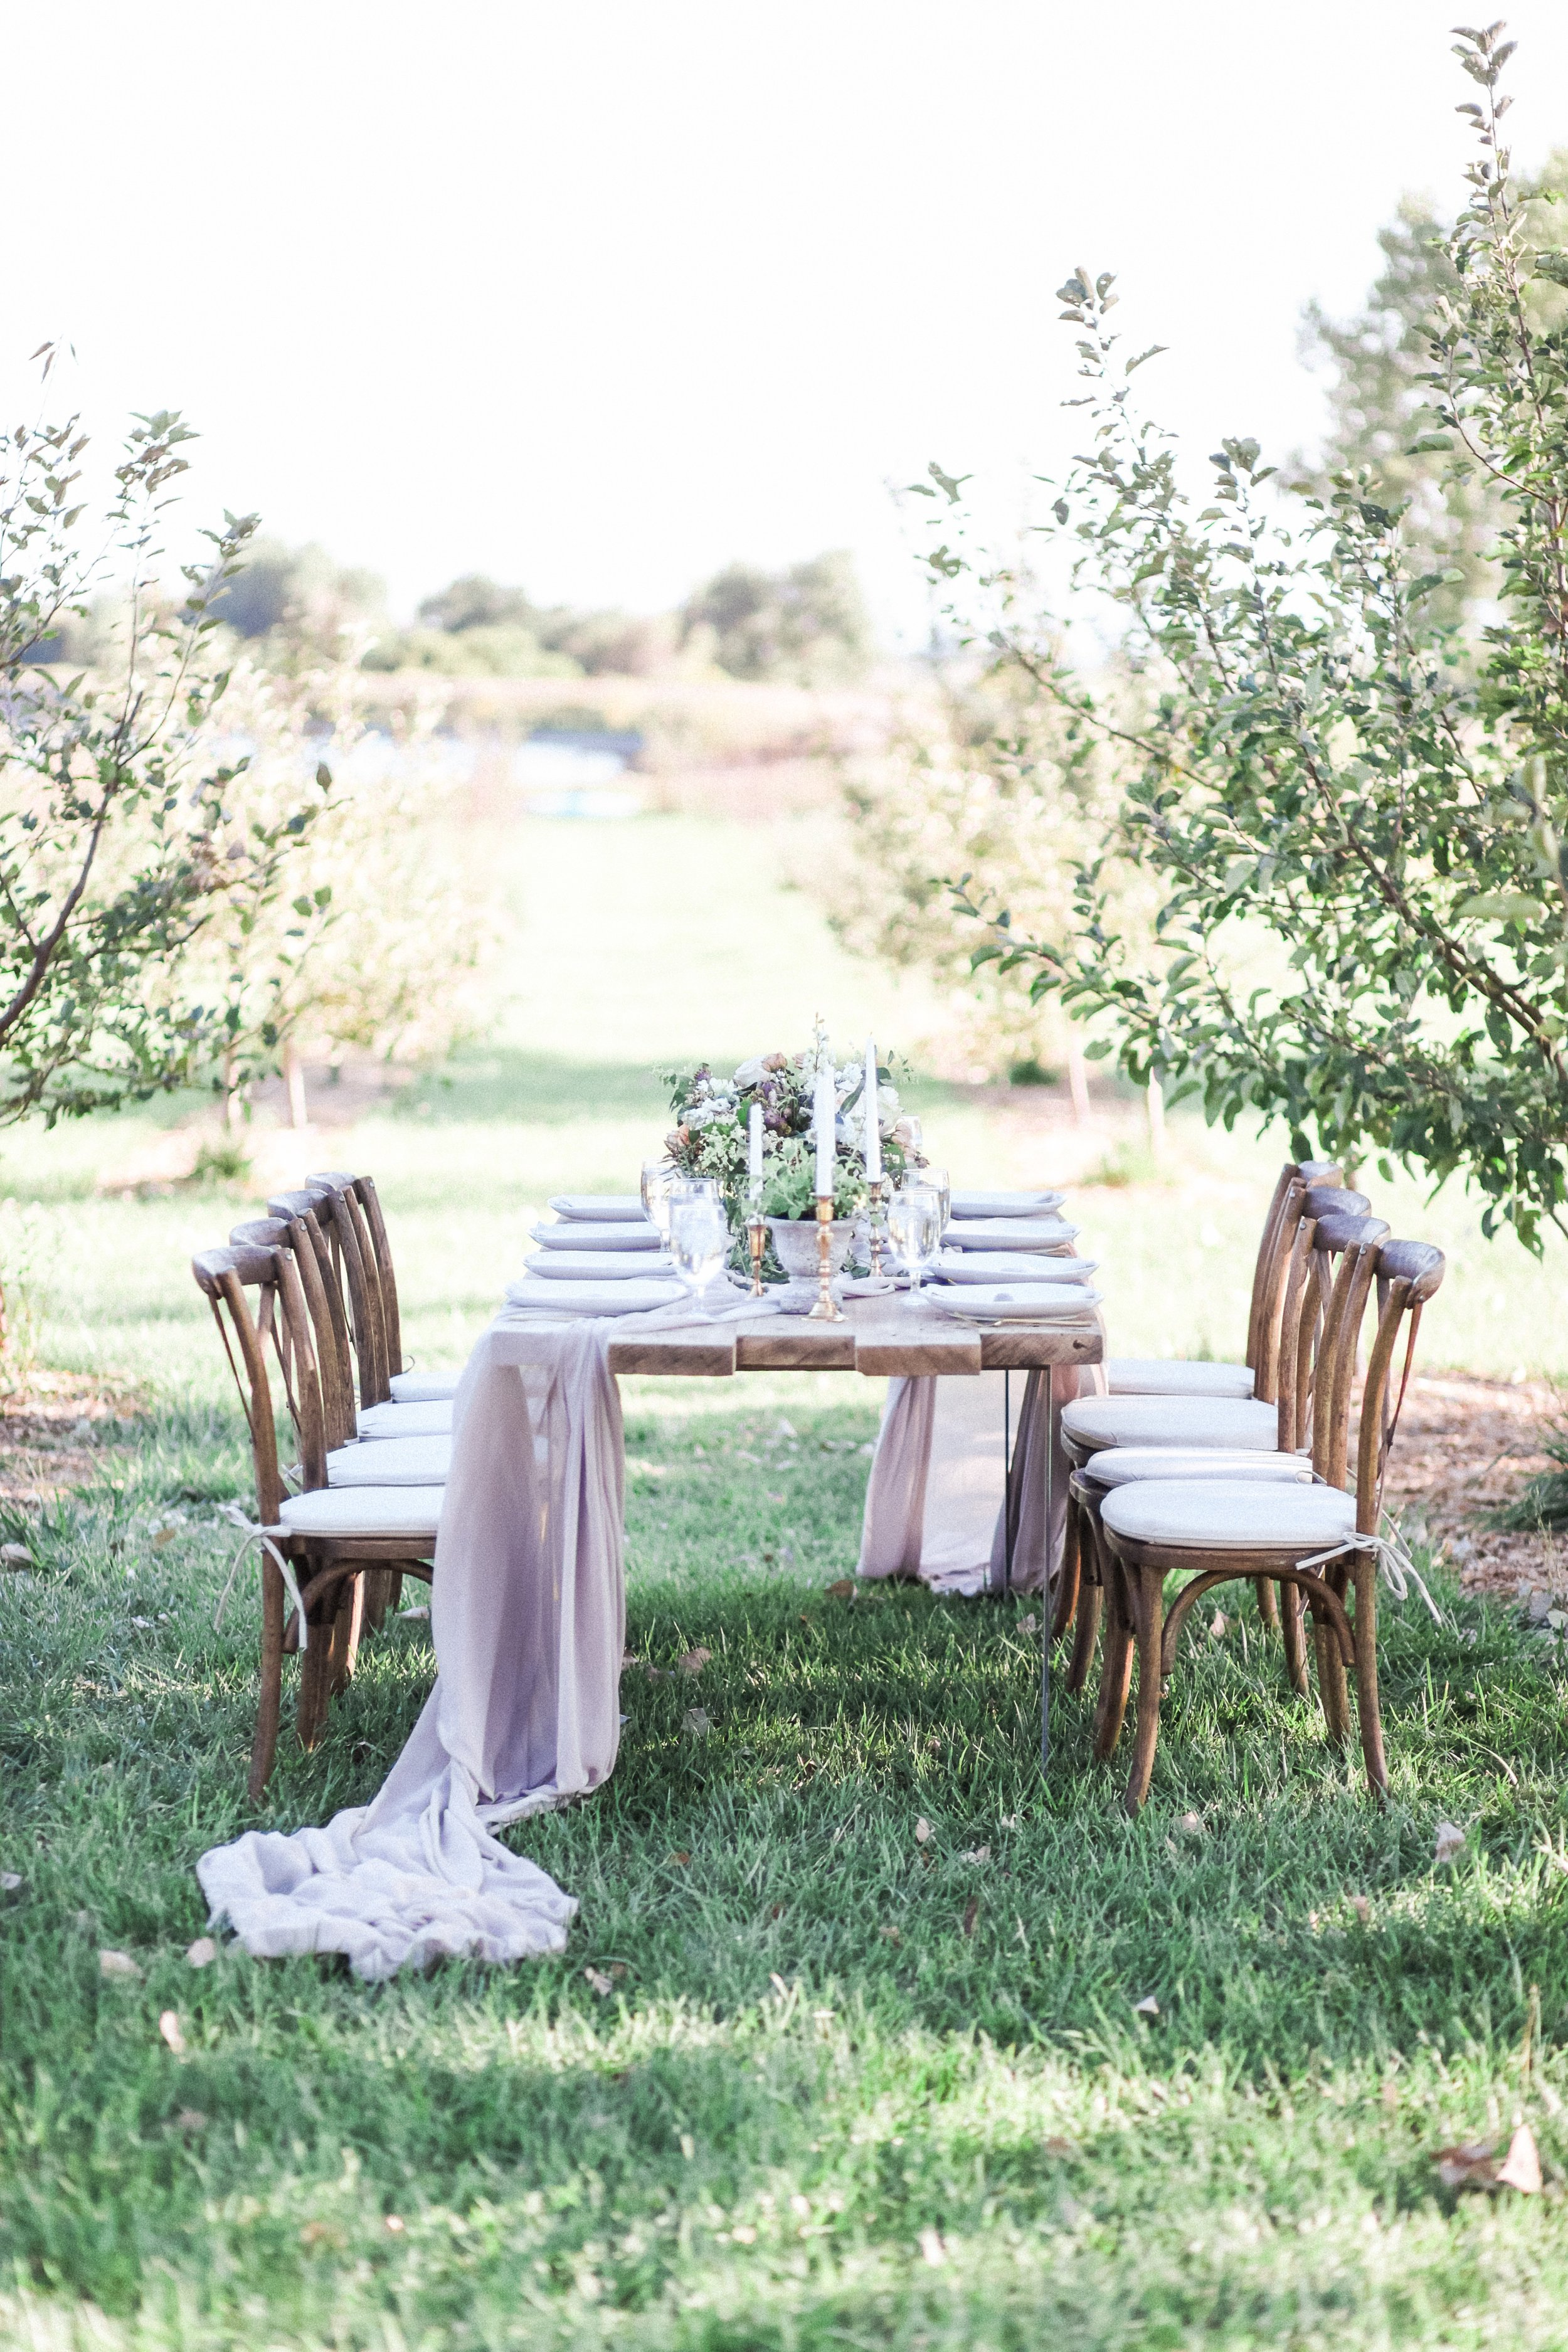 Dinner-Party-Ideas-Apple-Orchard-Rehearsal-Charcuterie-Board21.jpg